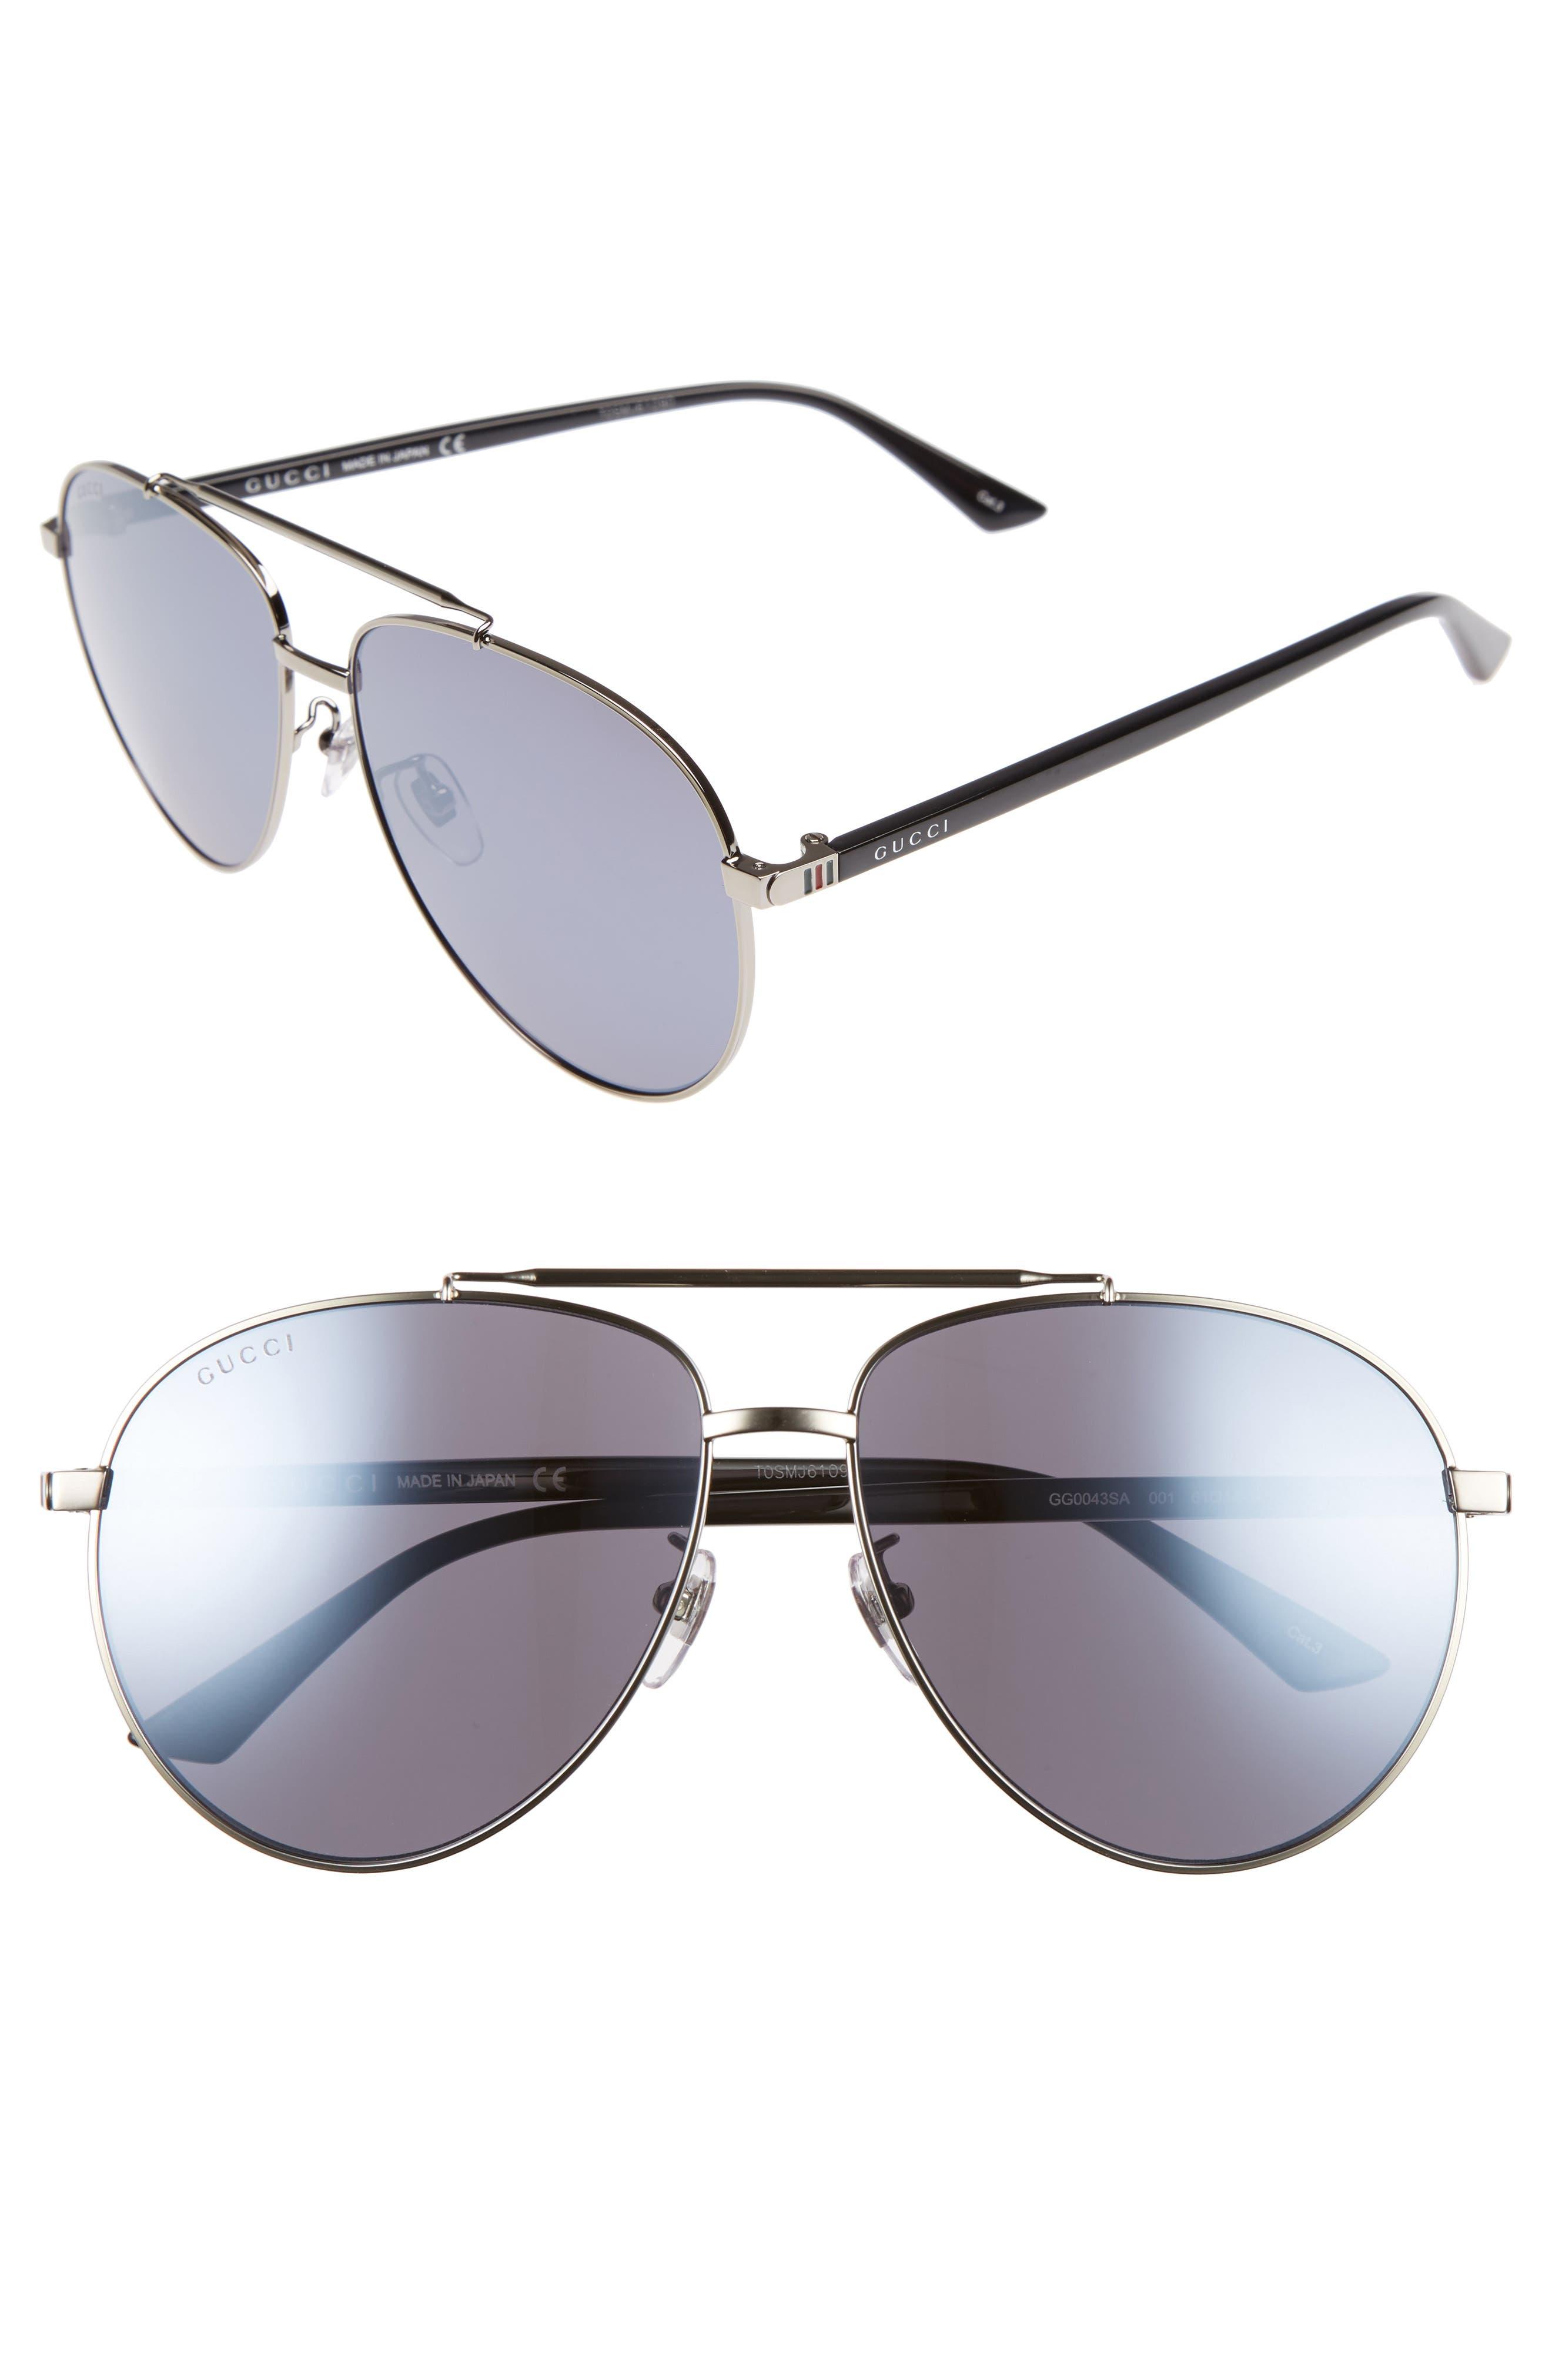 61mm Aviator Sunglasses,                             Main thumbnail 1, color,                             040